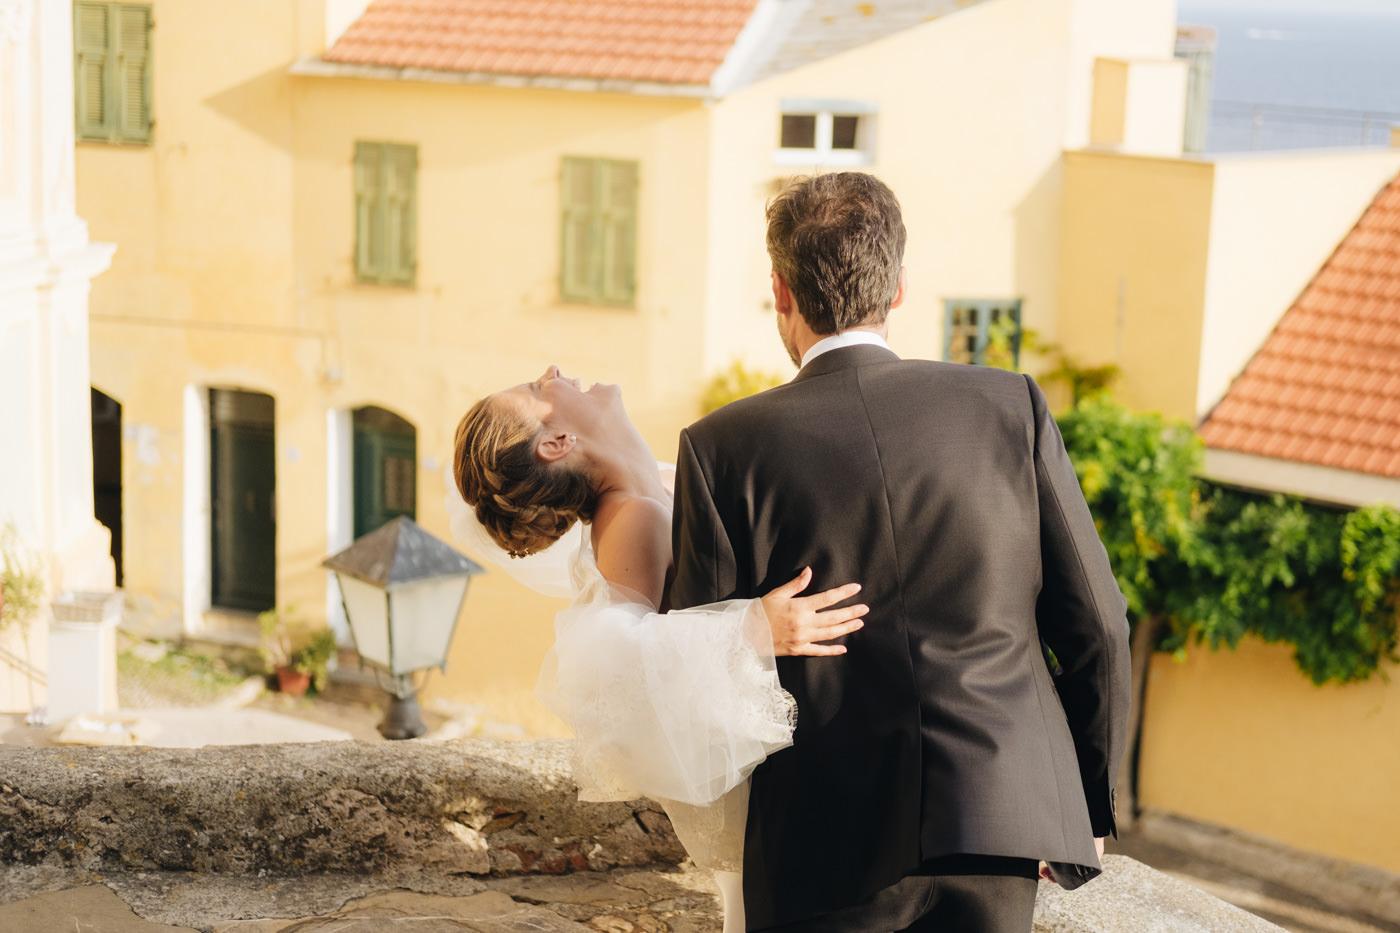 matrimoni_all_italiana_fotografo_matrimonio_cinque_terre-41.jpg